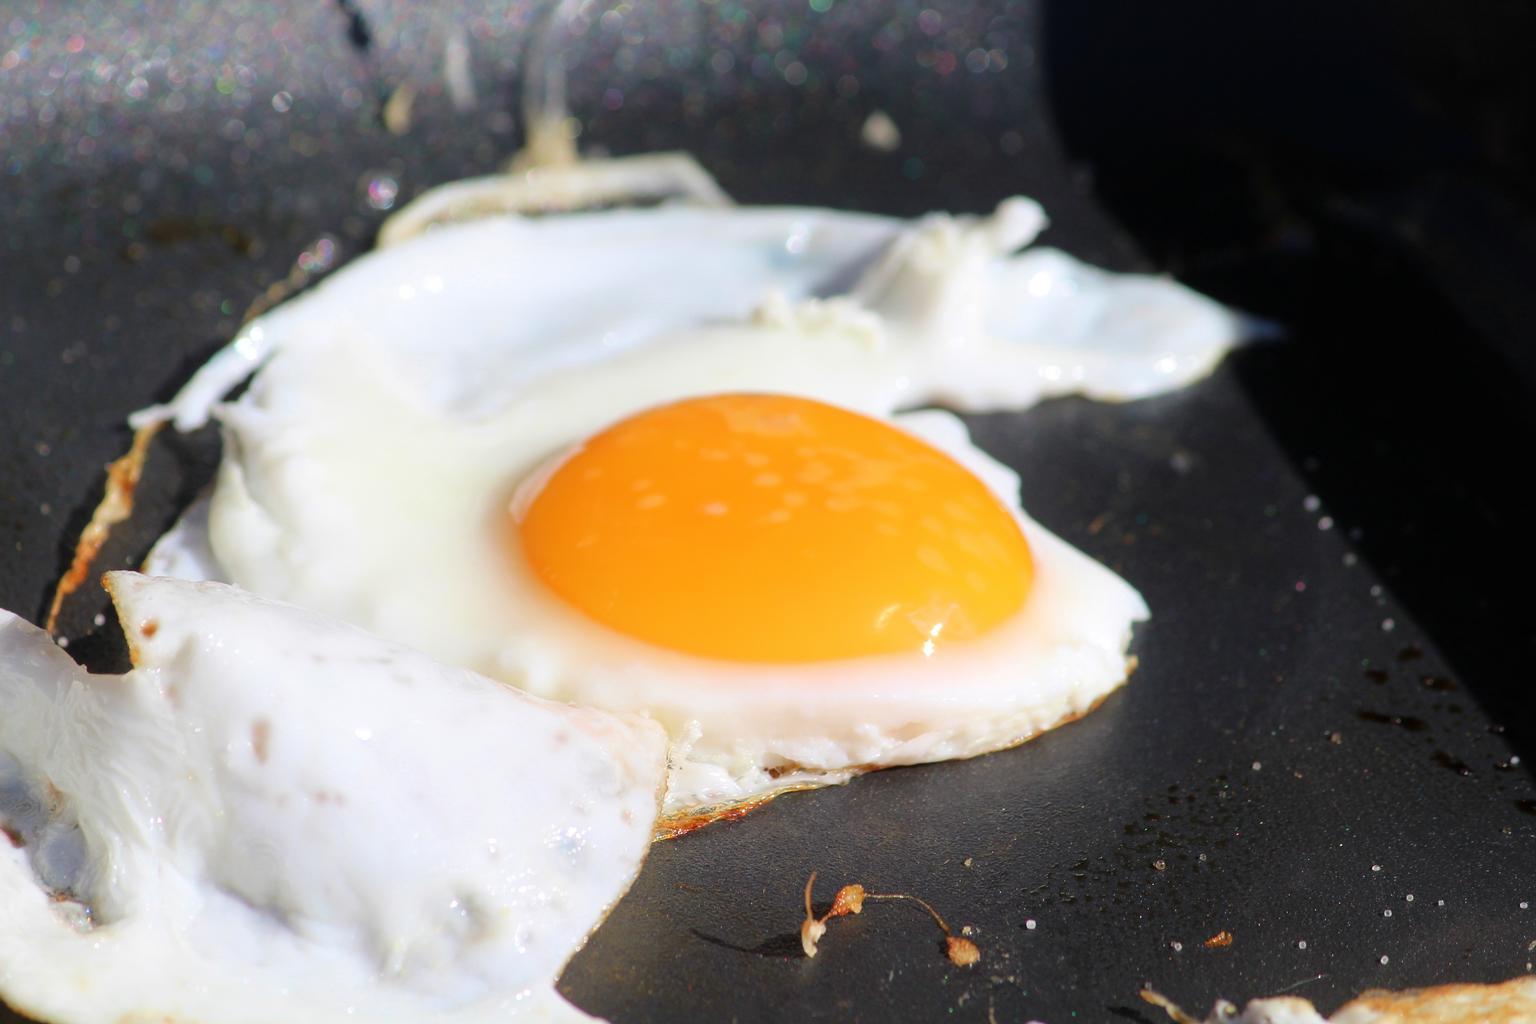 vajce na panvici